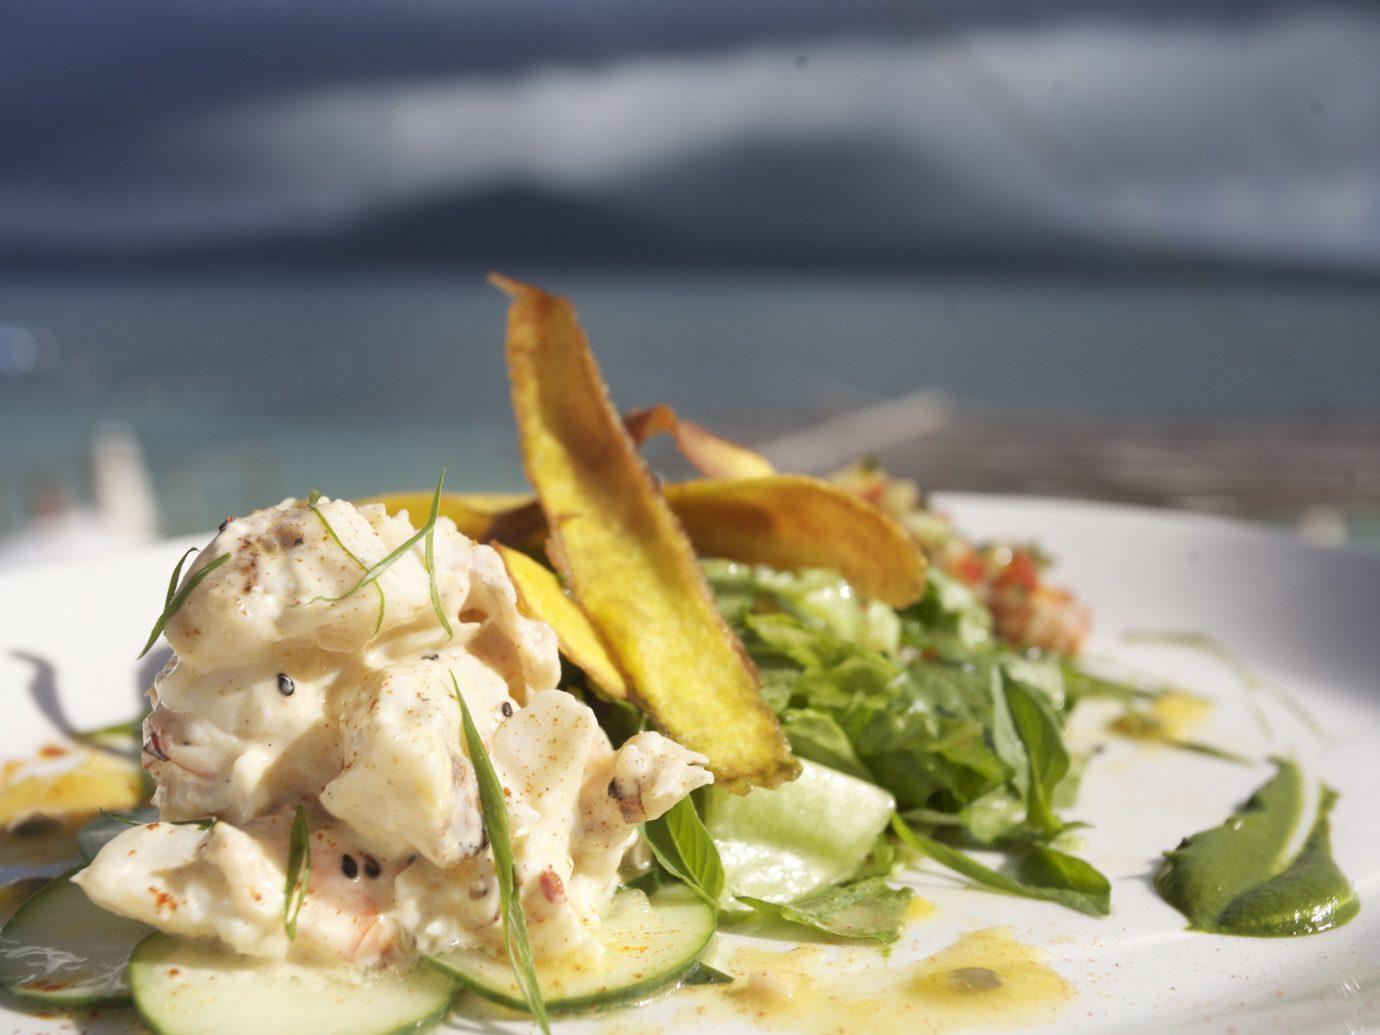 Trip Ideas food dish plate cuisine meal produce vegetable breakfast